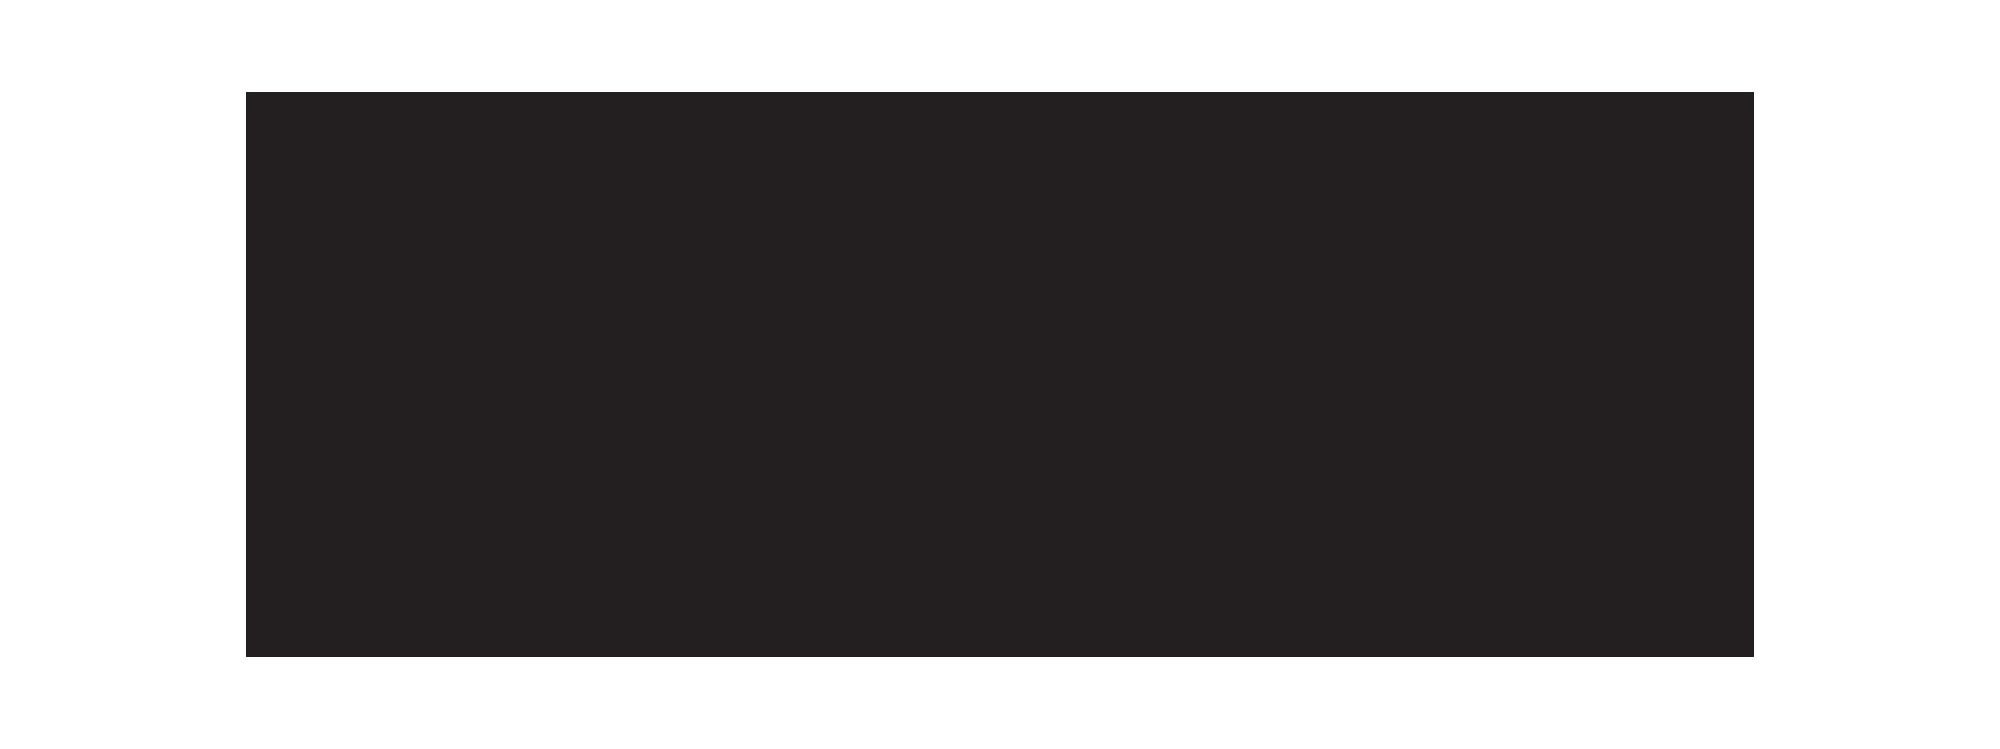 Asbury Park Fight Club